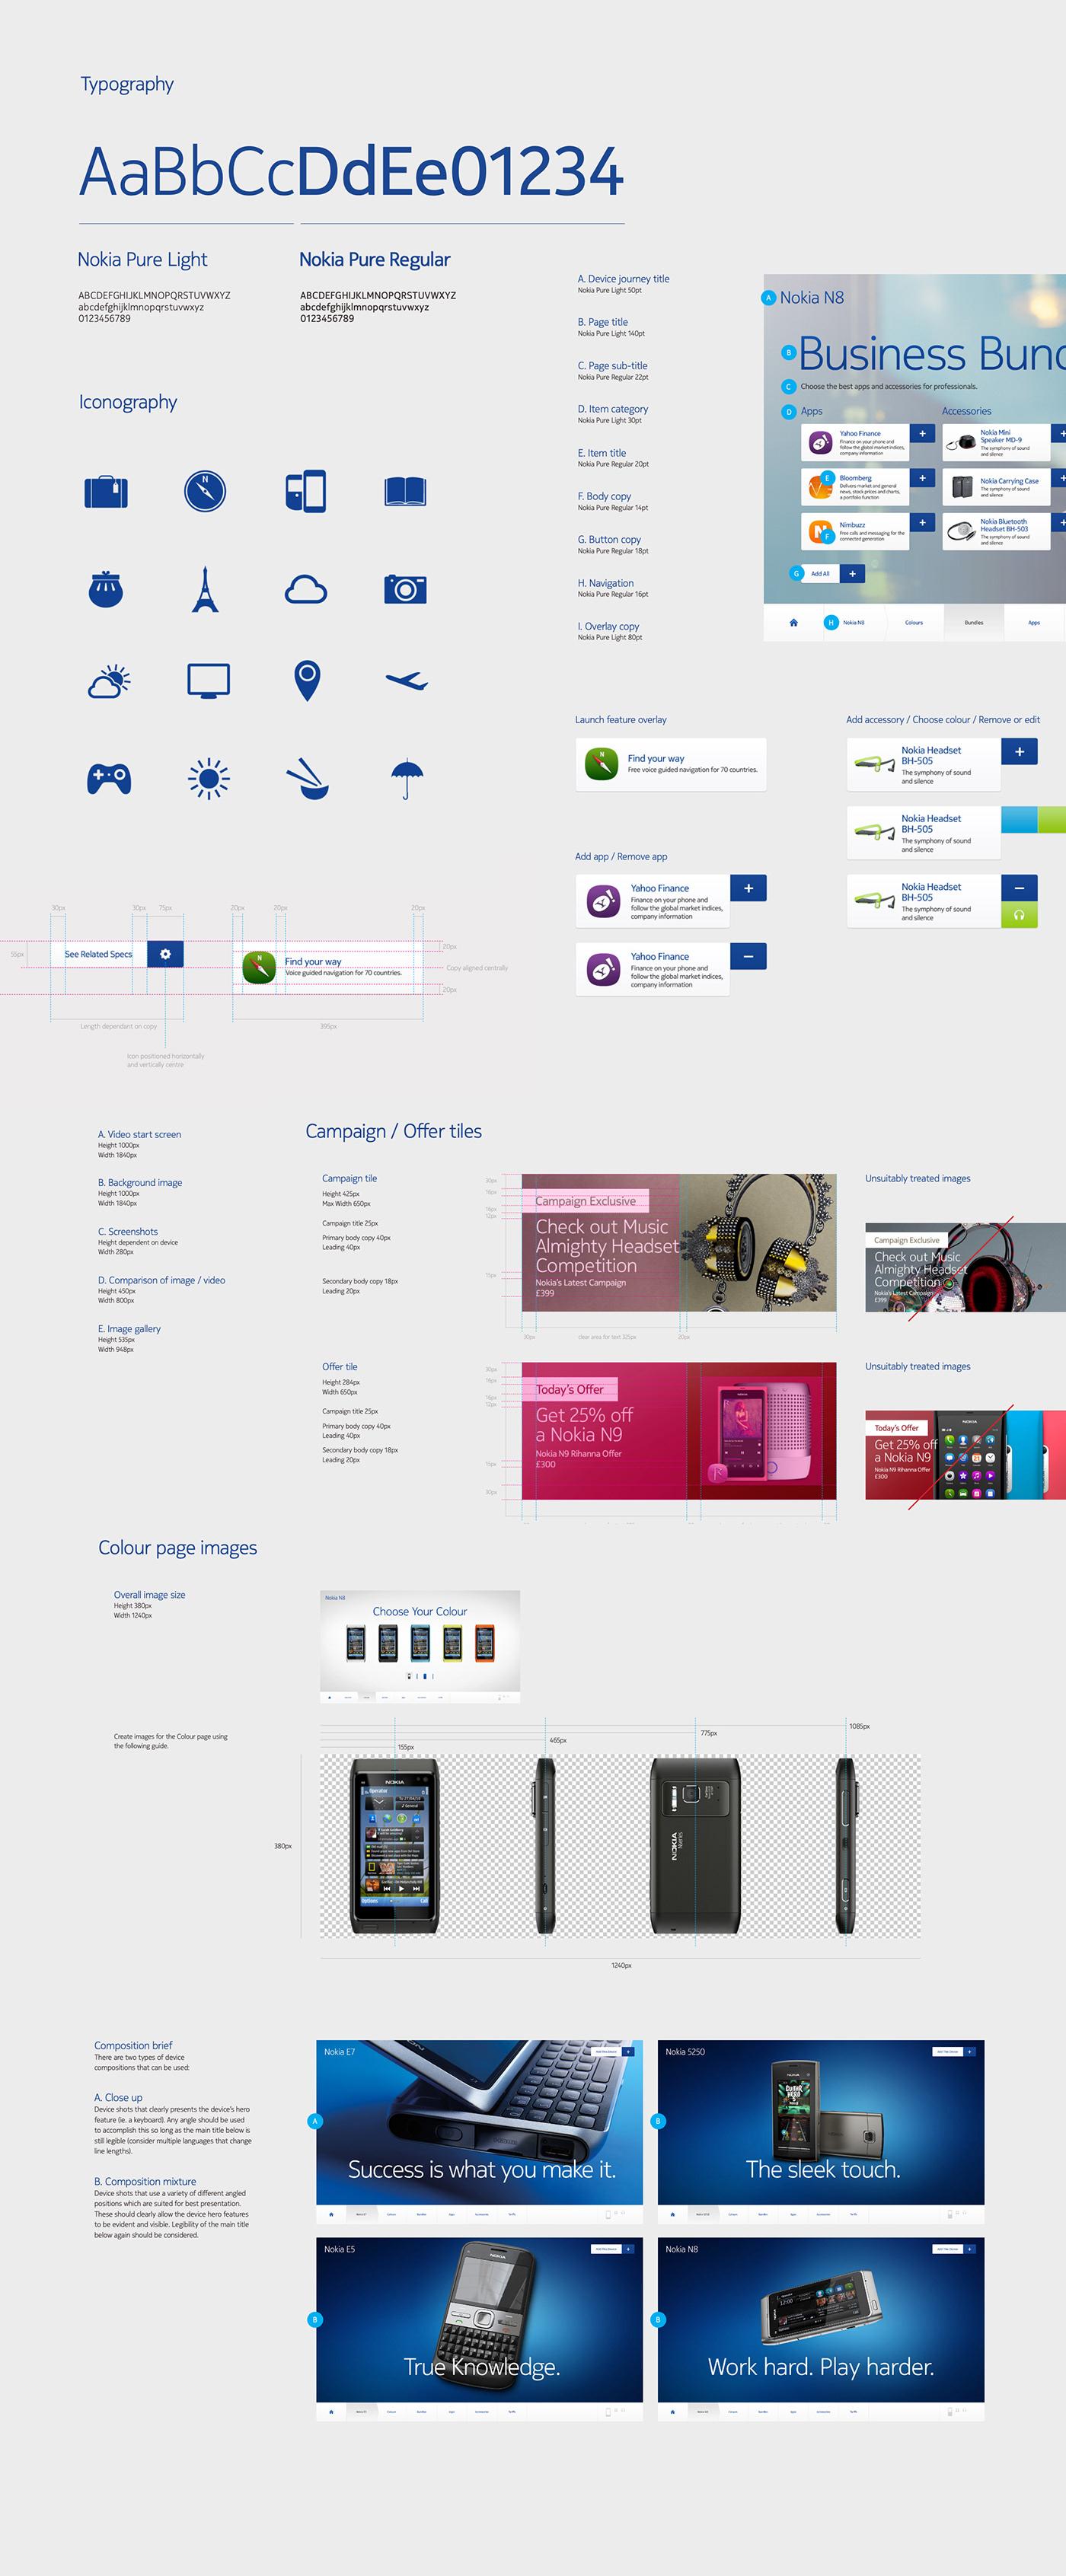 branding  Kiosk mobile Retail telco touchscreen ui design user experience ux visual design